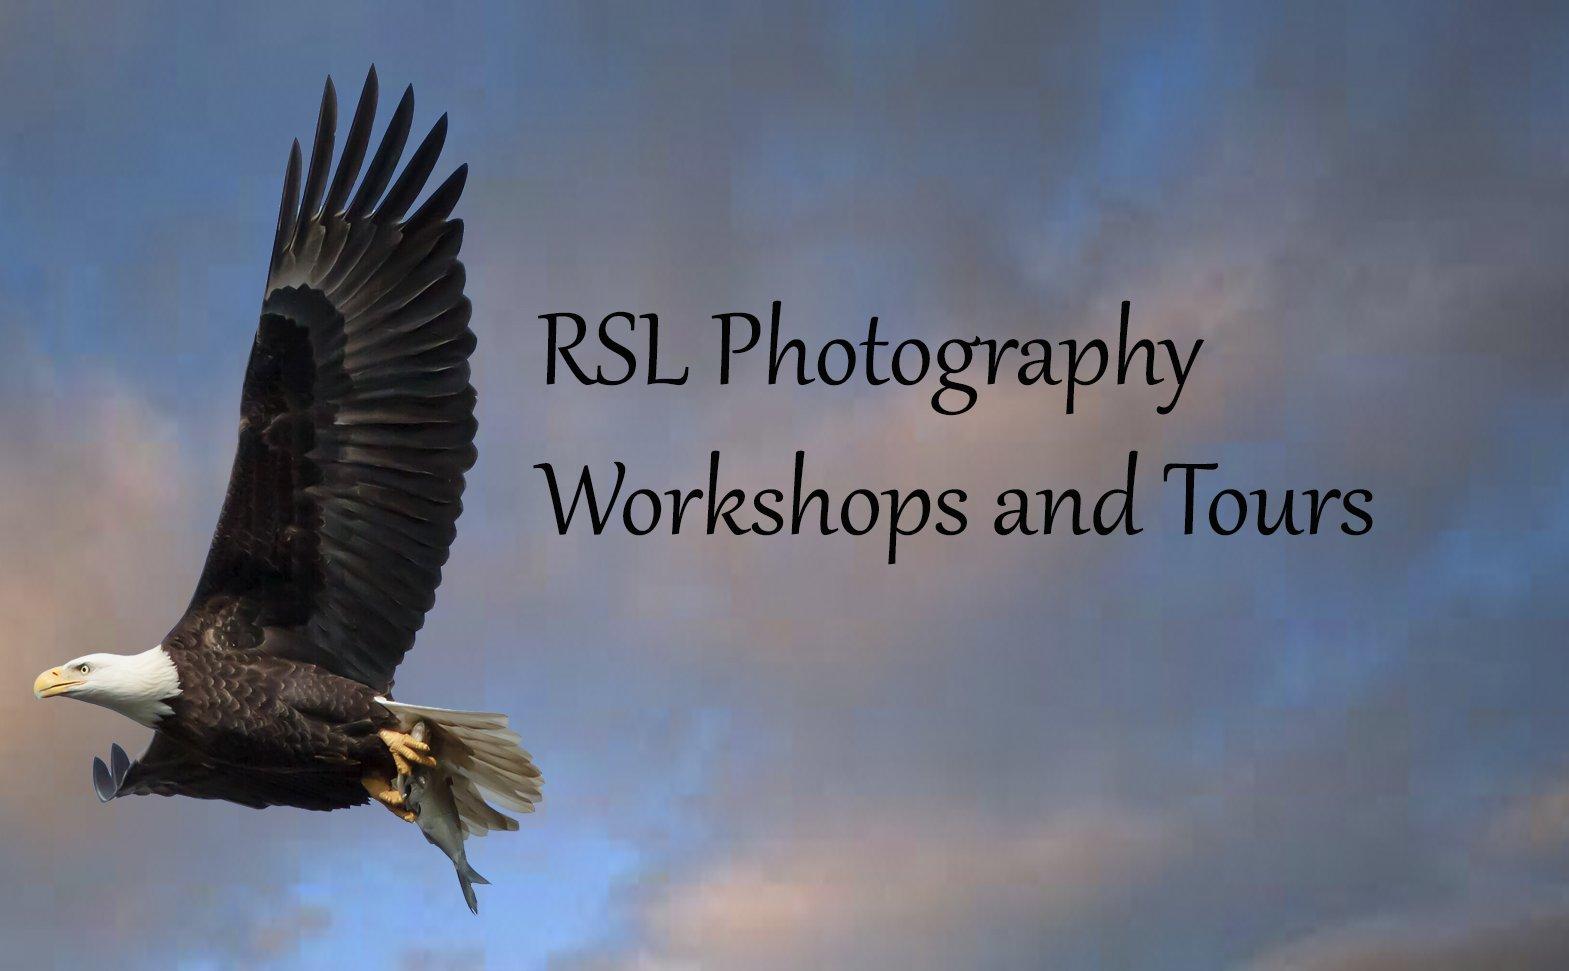 RSL photography